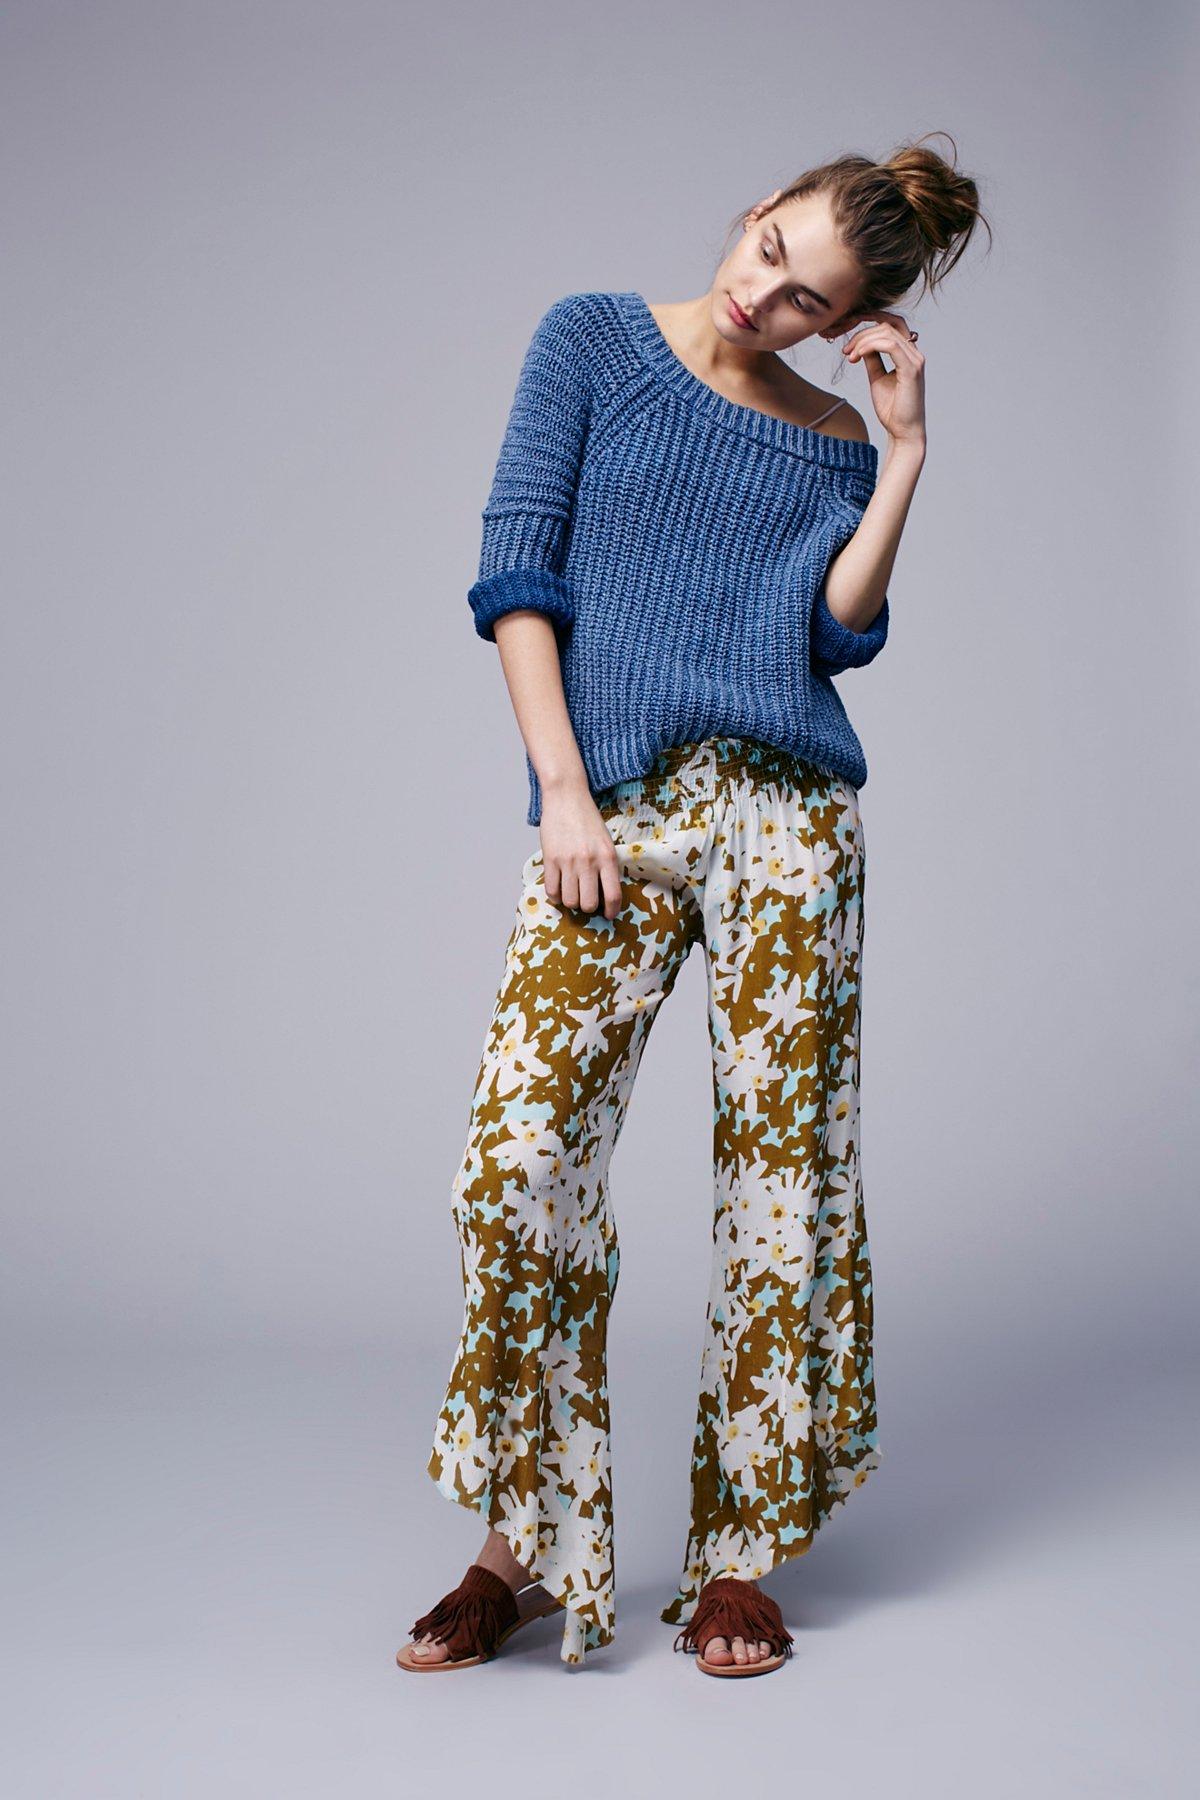 Lucina花卉图案嬉皮风长裤